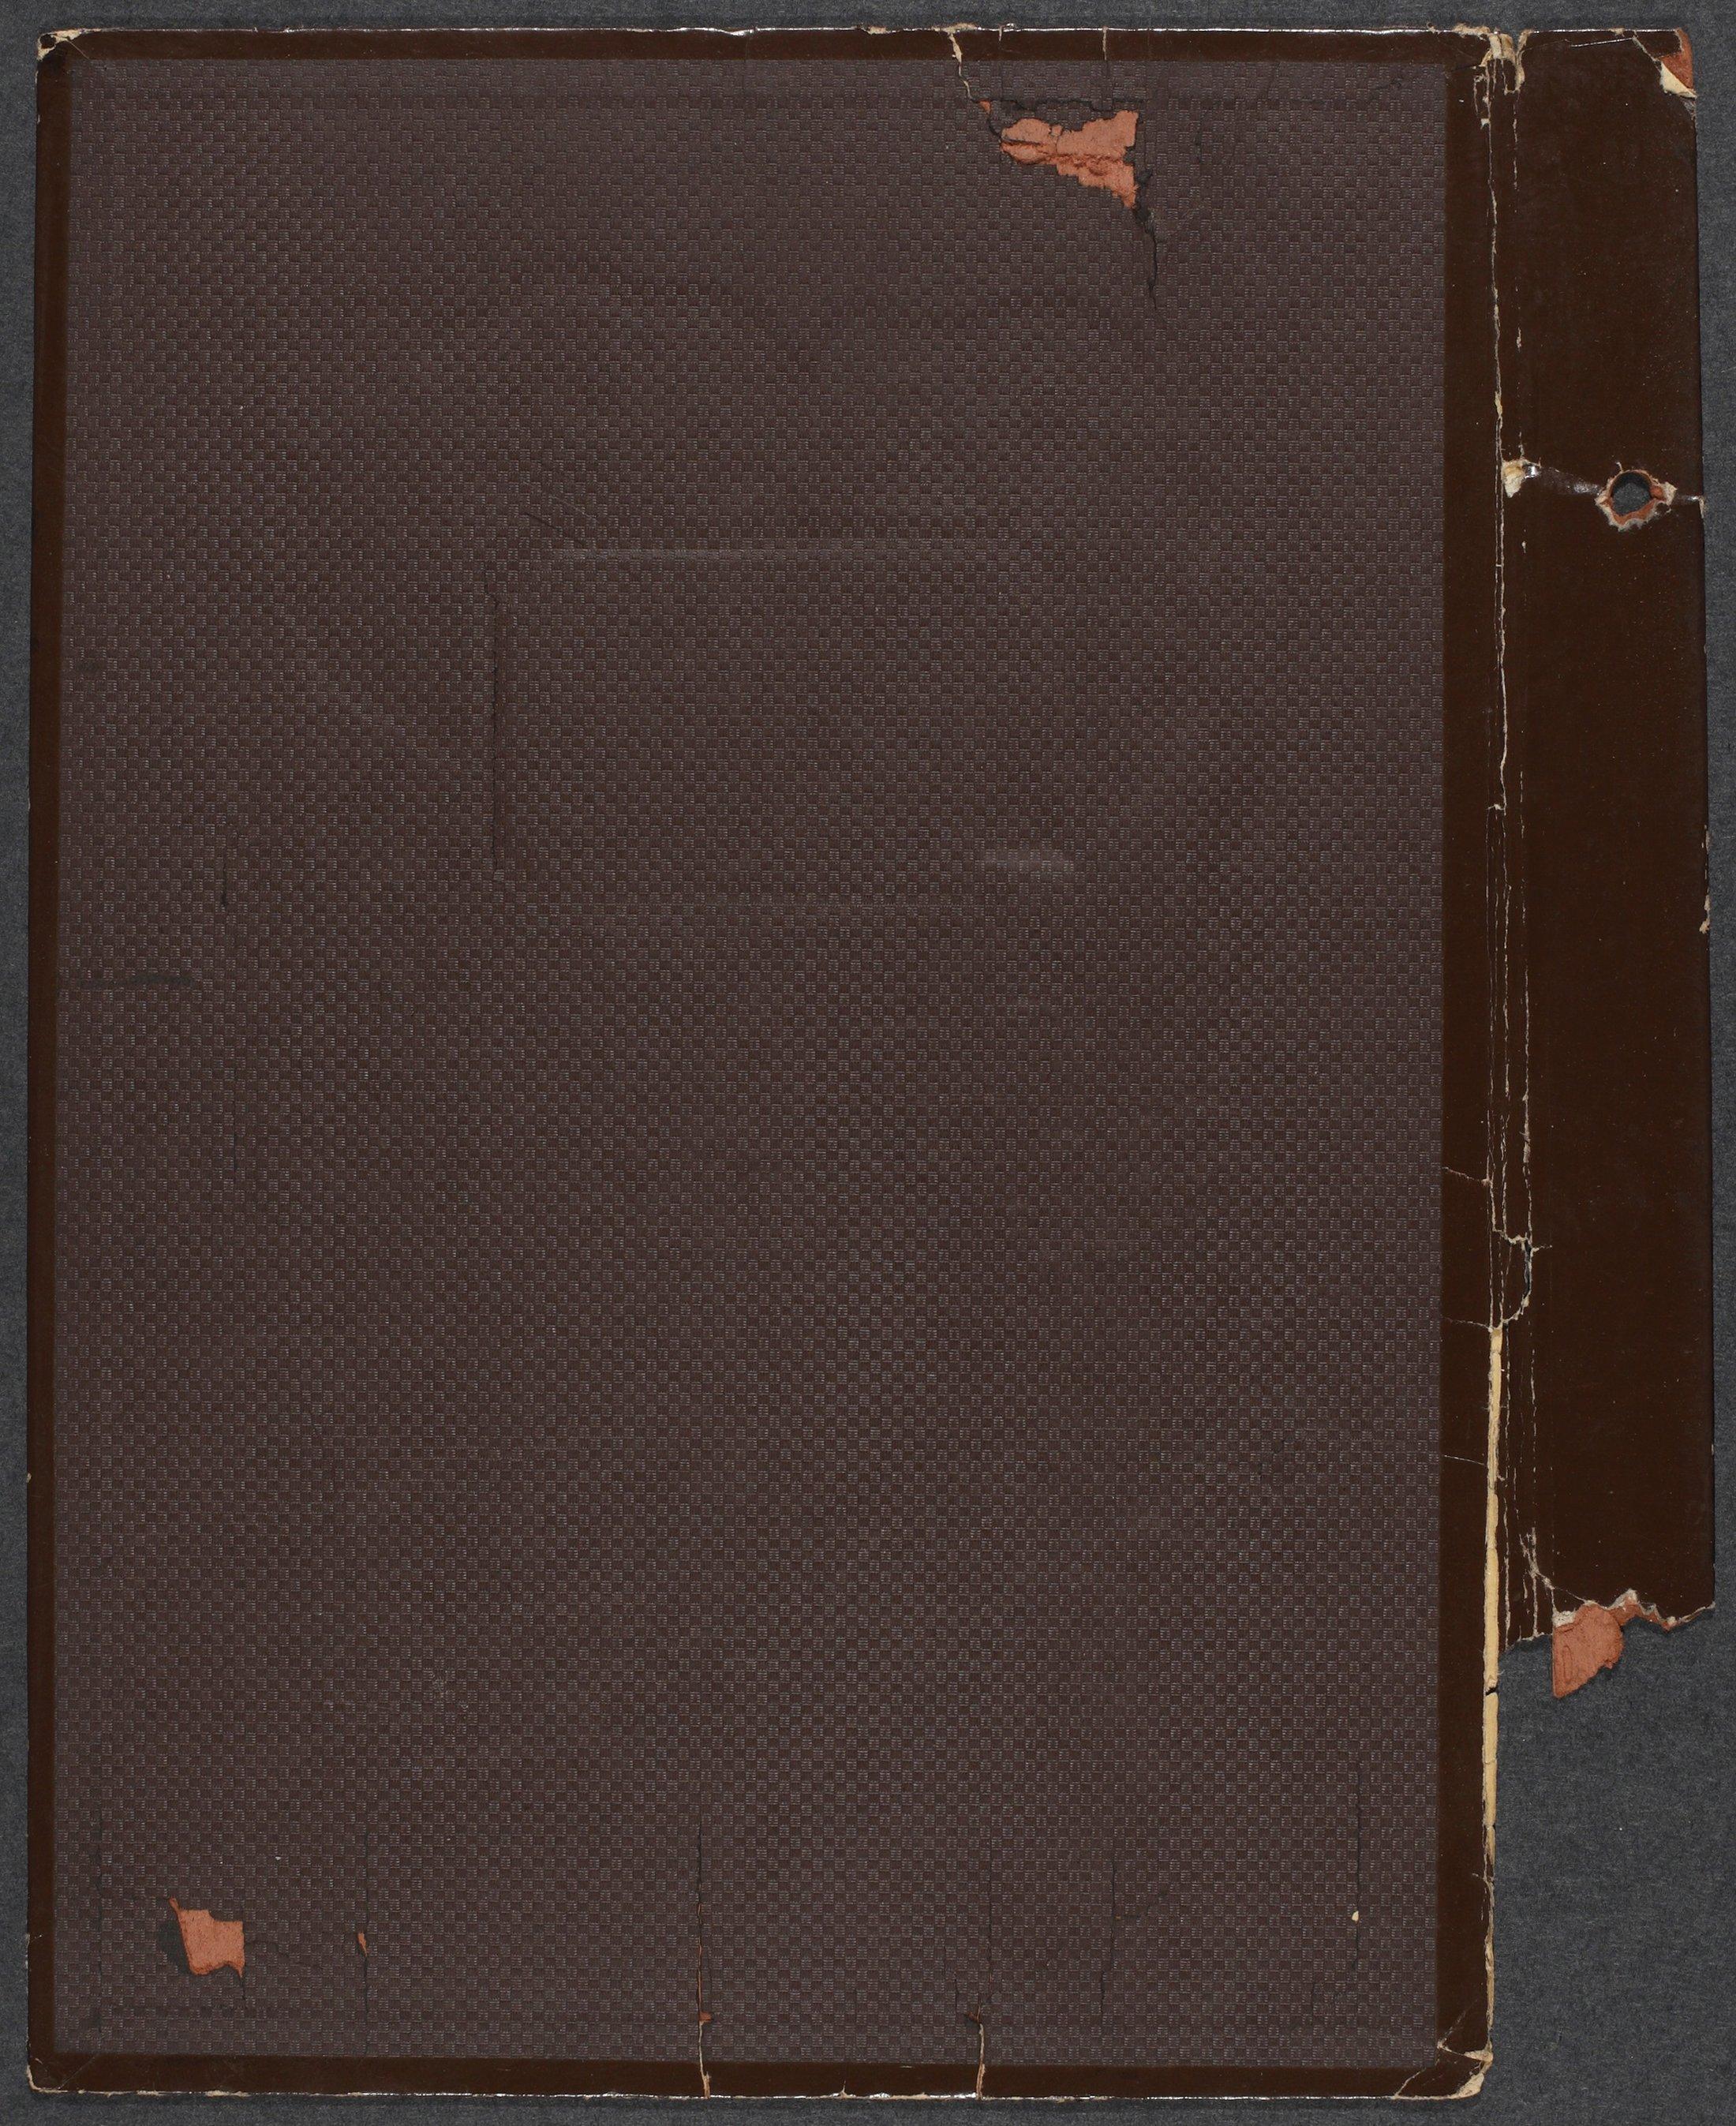 Charles Gordon scrapbook - 2